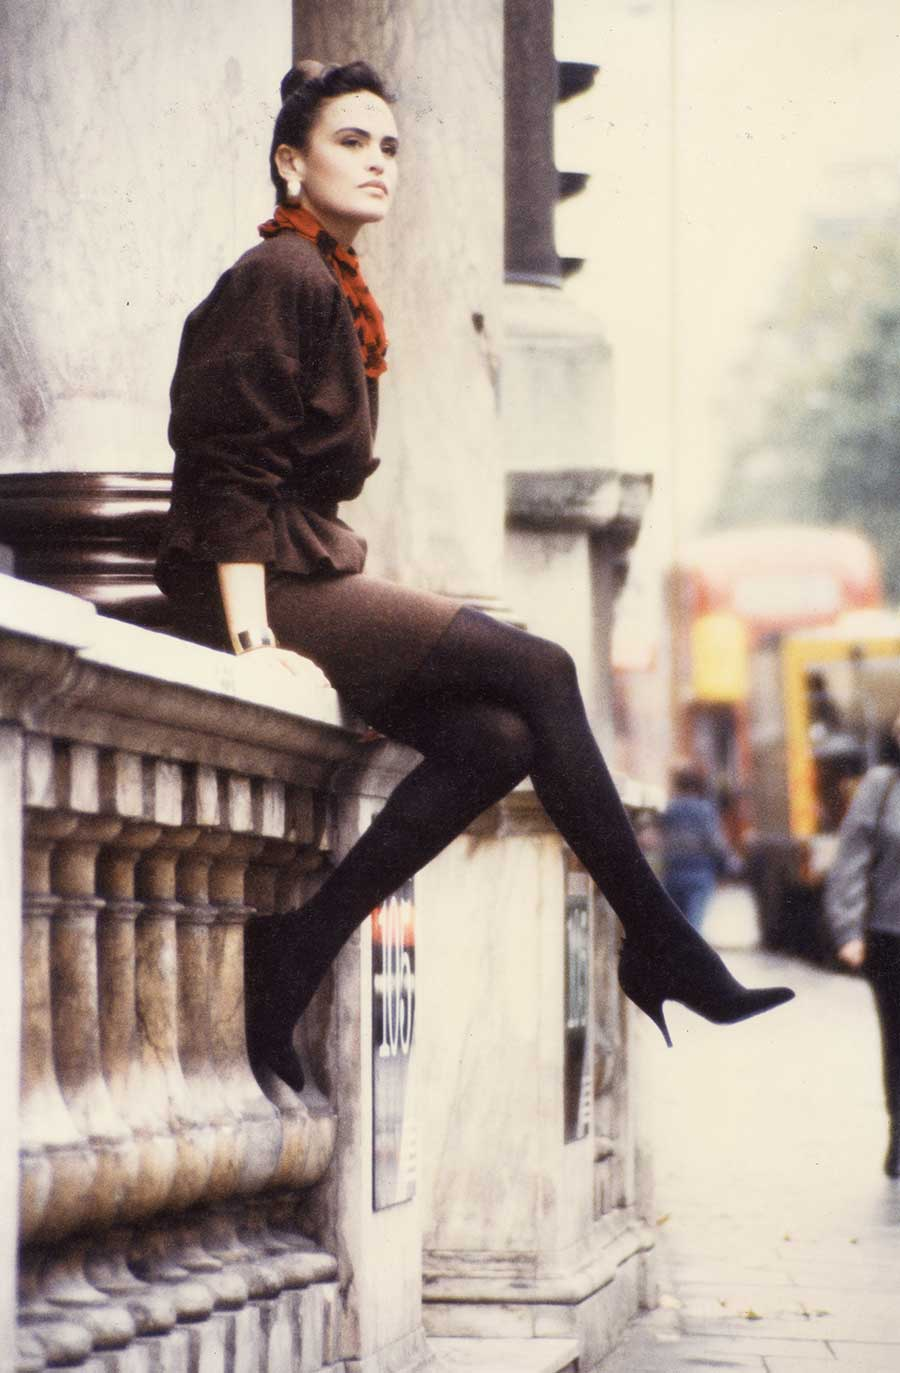 justina-vail-evans-metropolitan-magazine-1987